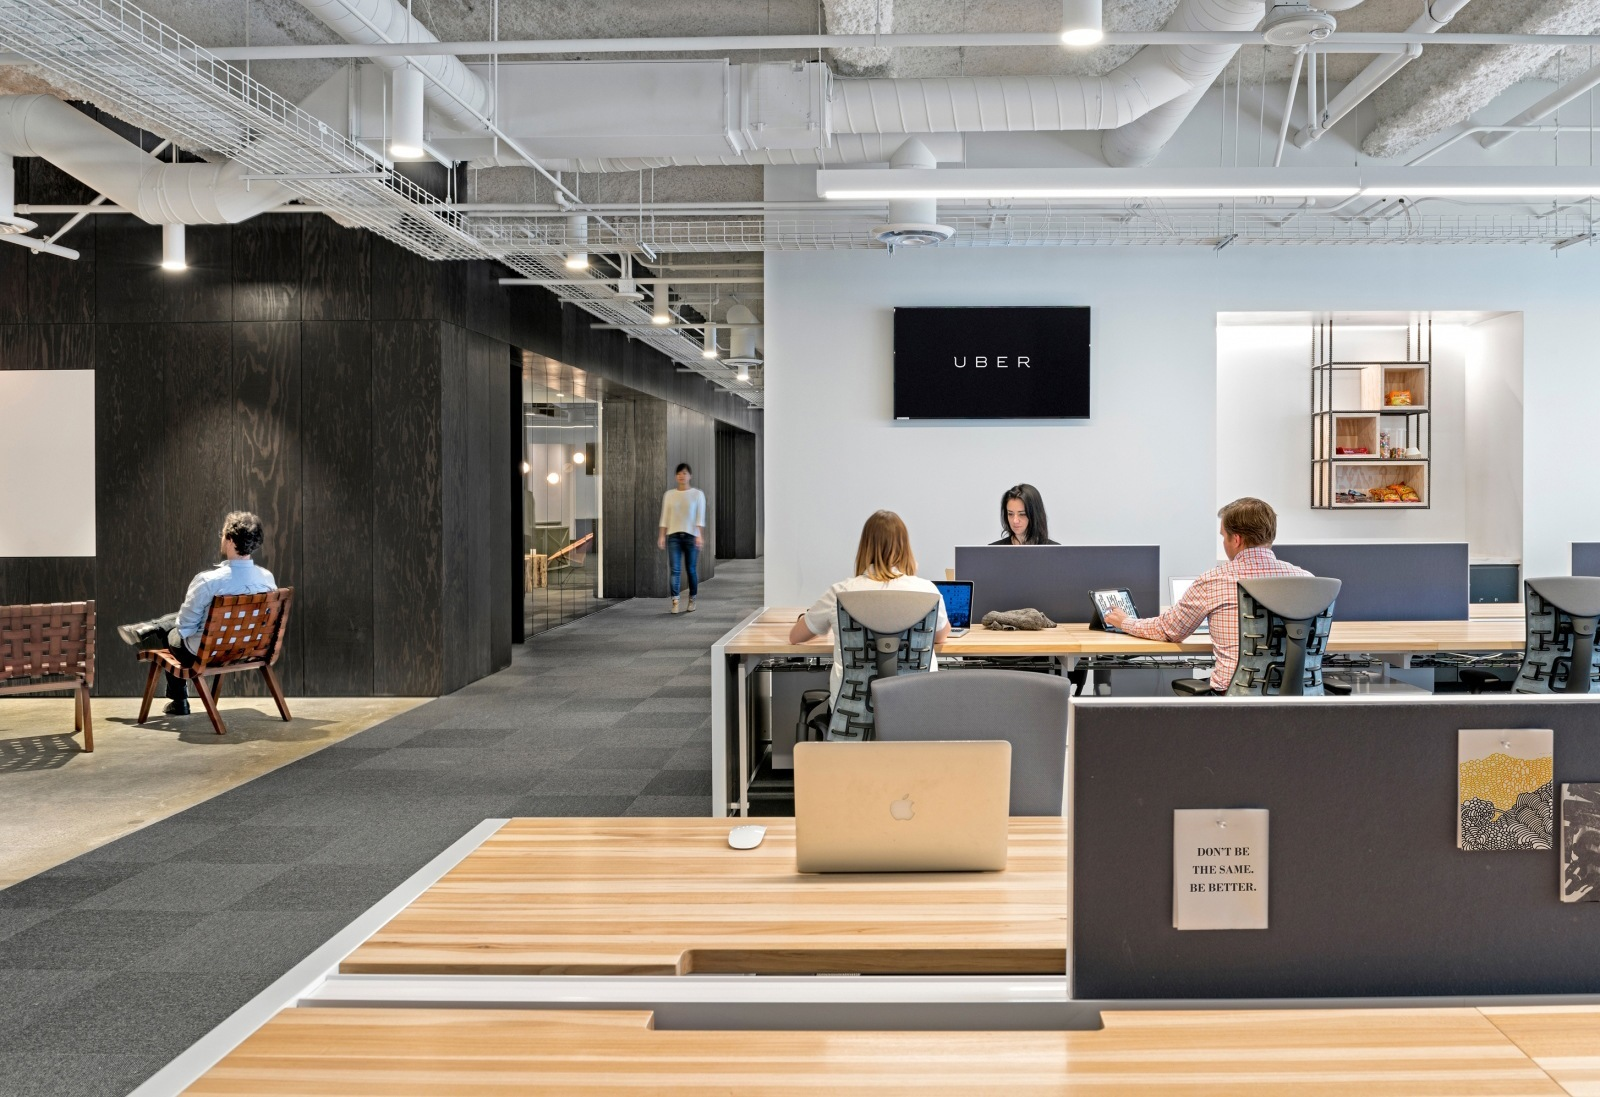 Uber Portland Oregon >> A Tour of Uber's New San Francisco Office - Officelovin